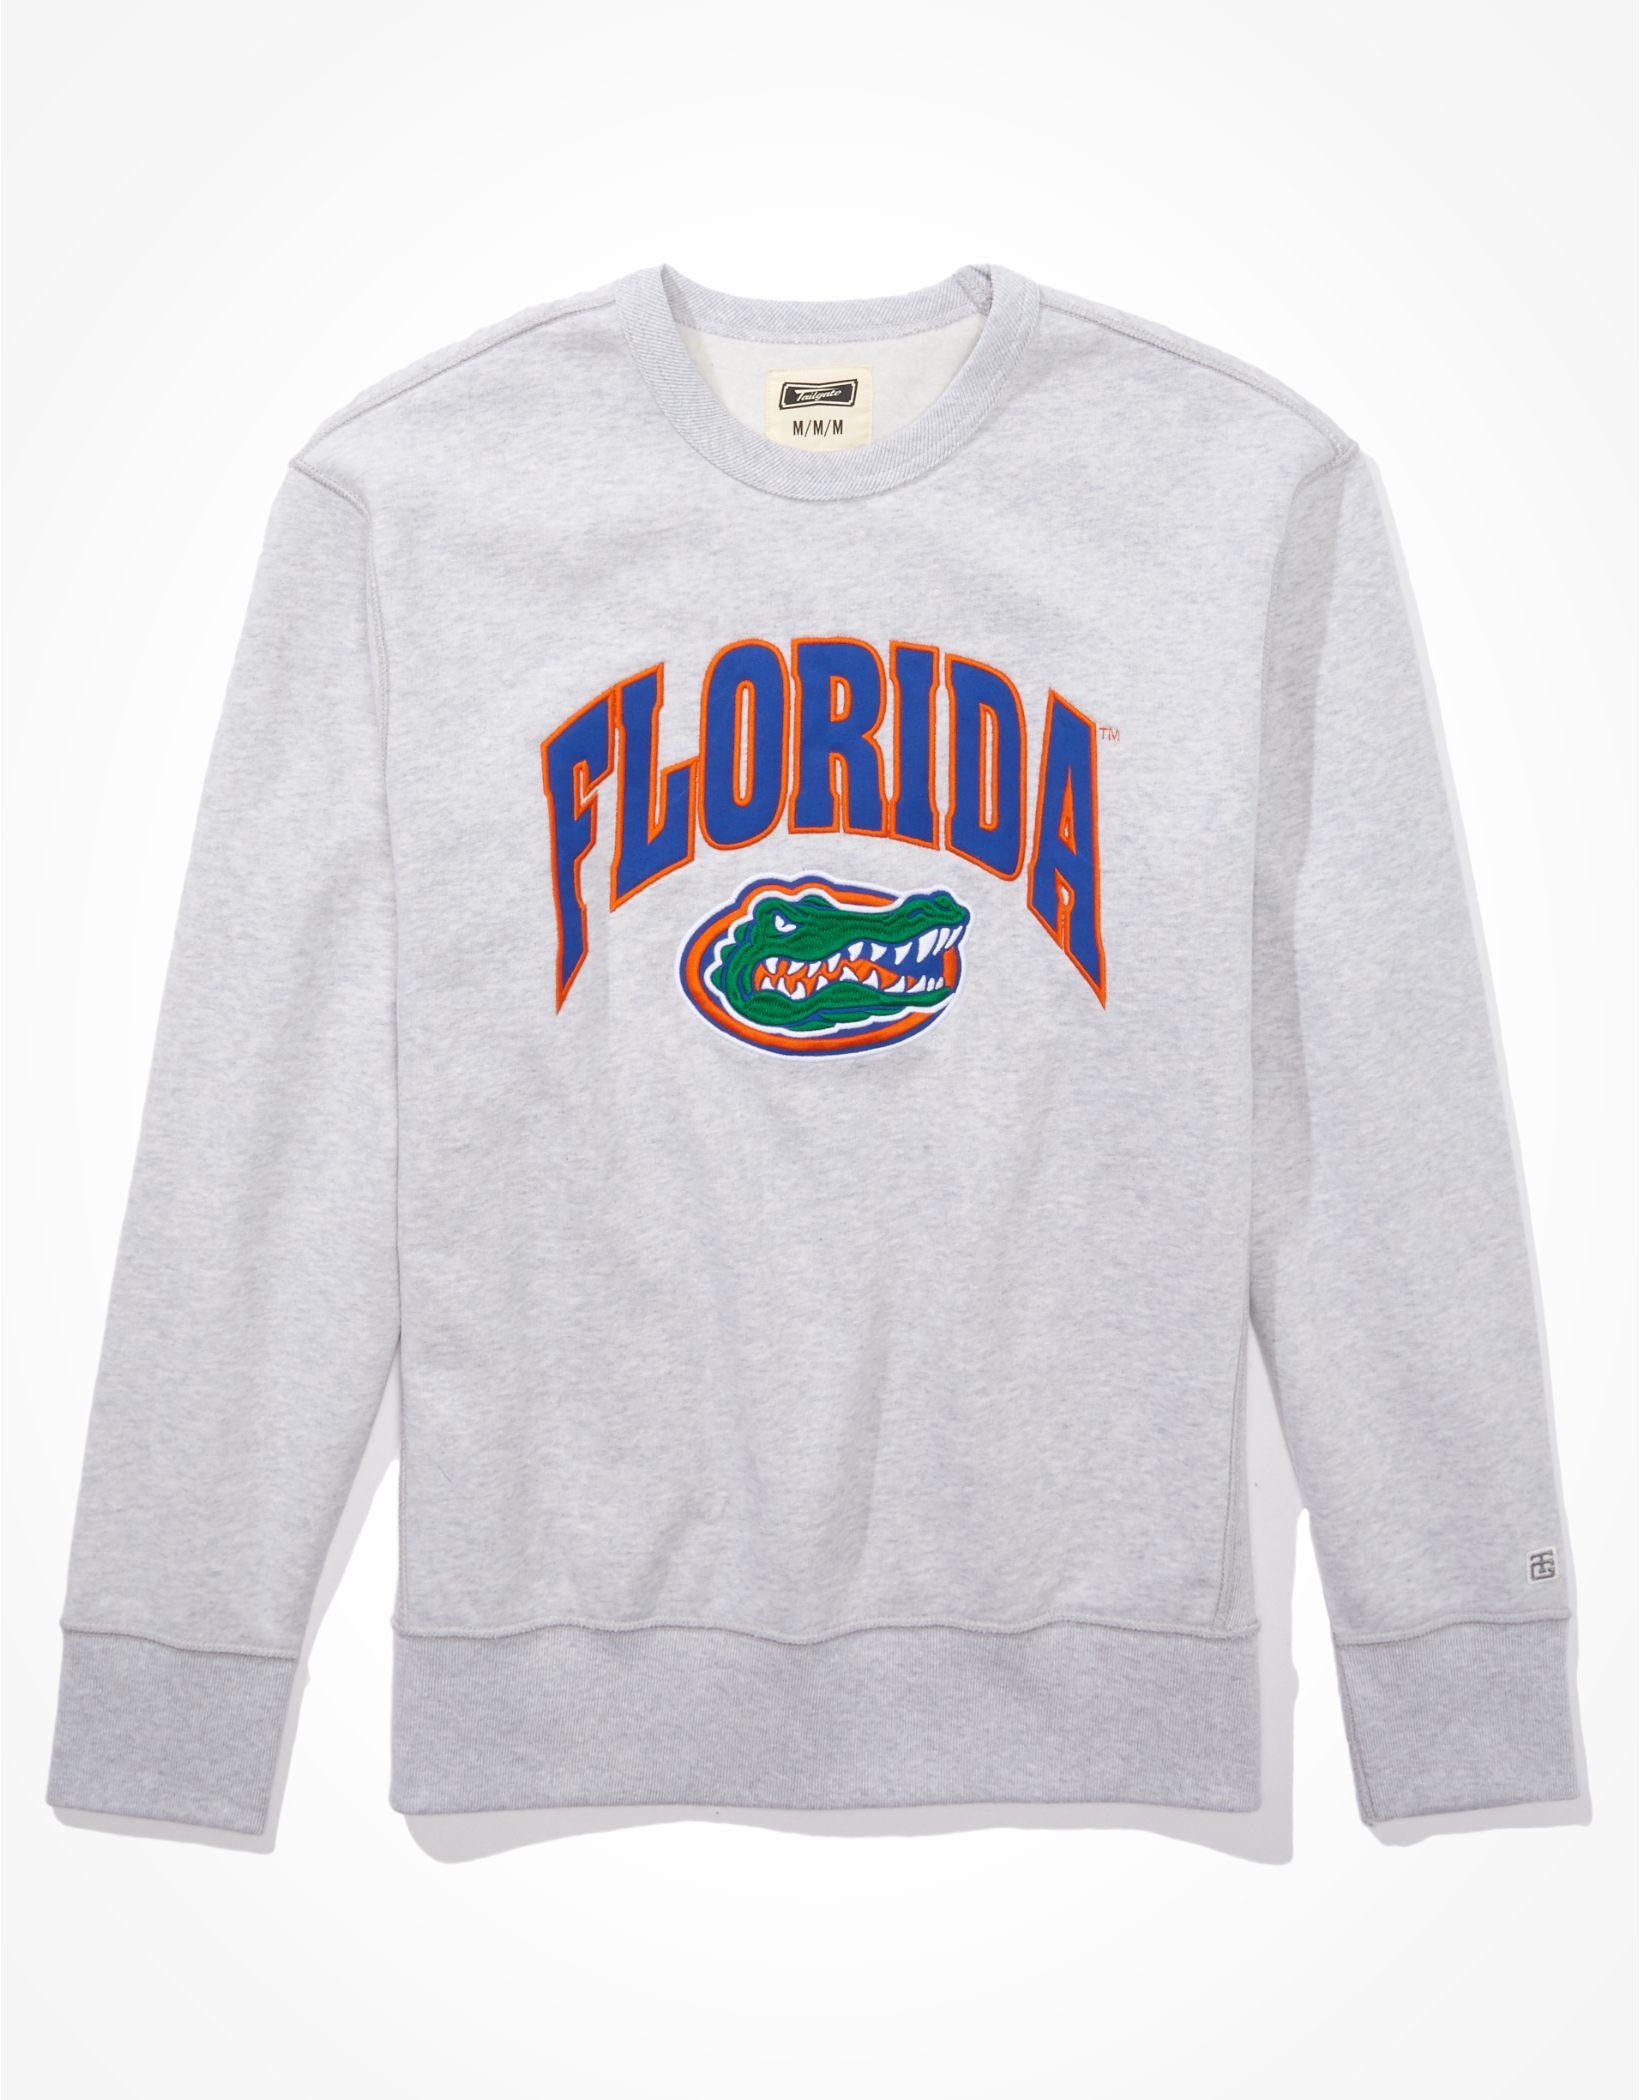 Tailgate Men's Florida Gators Crew Neck Sweatshirt